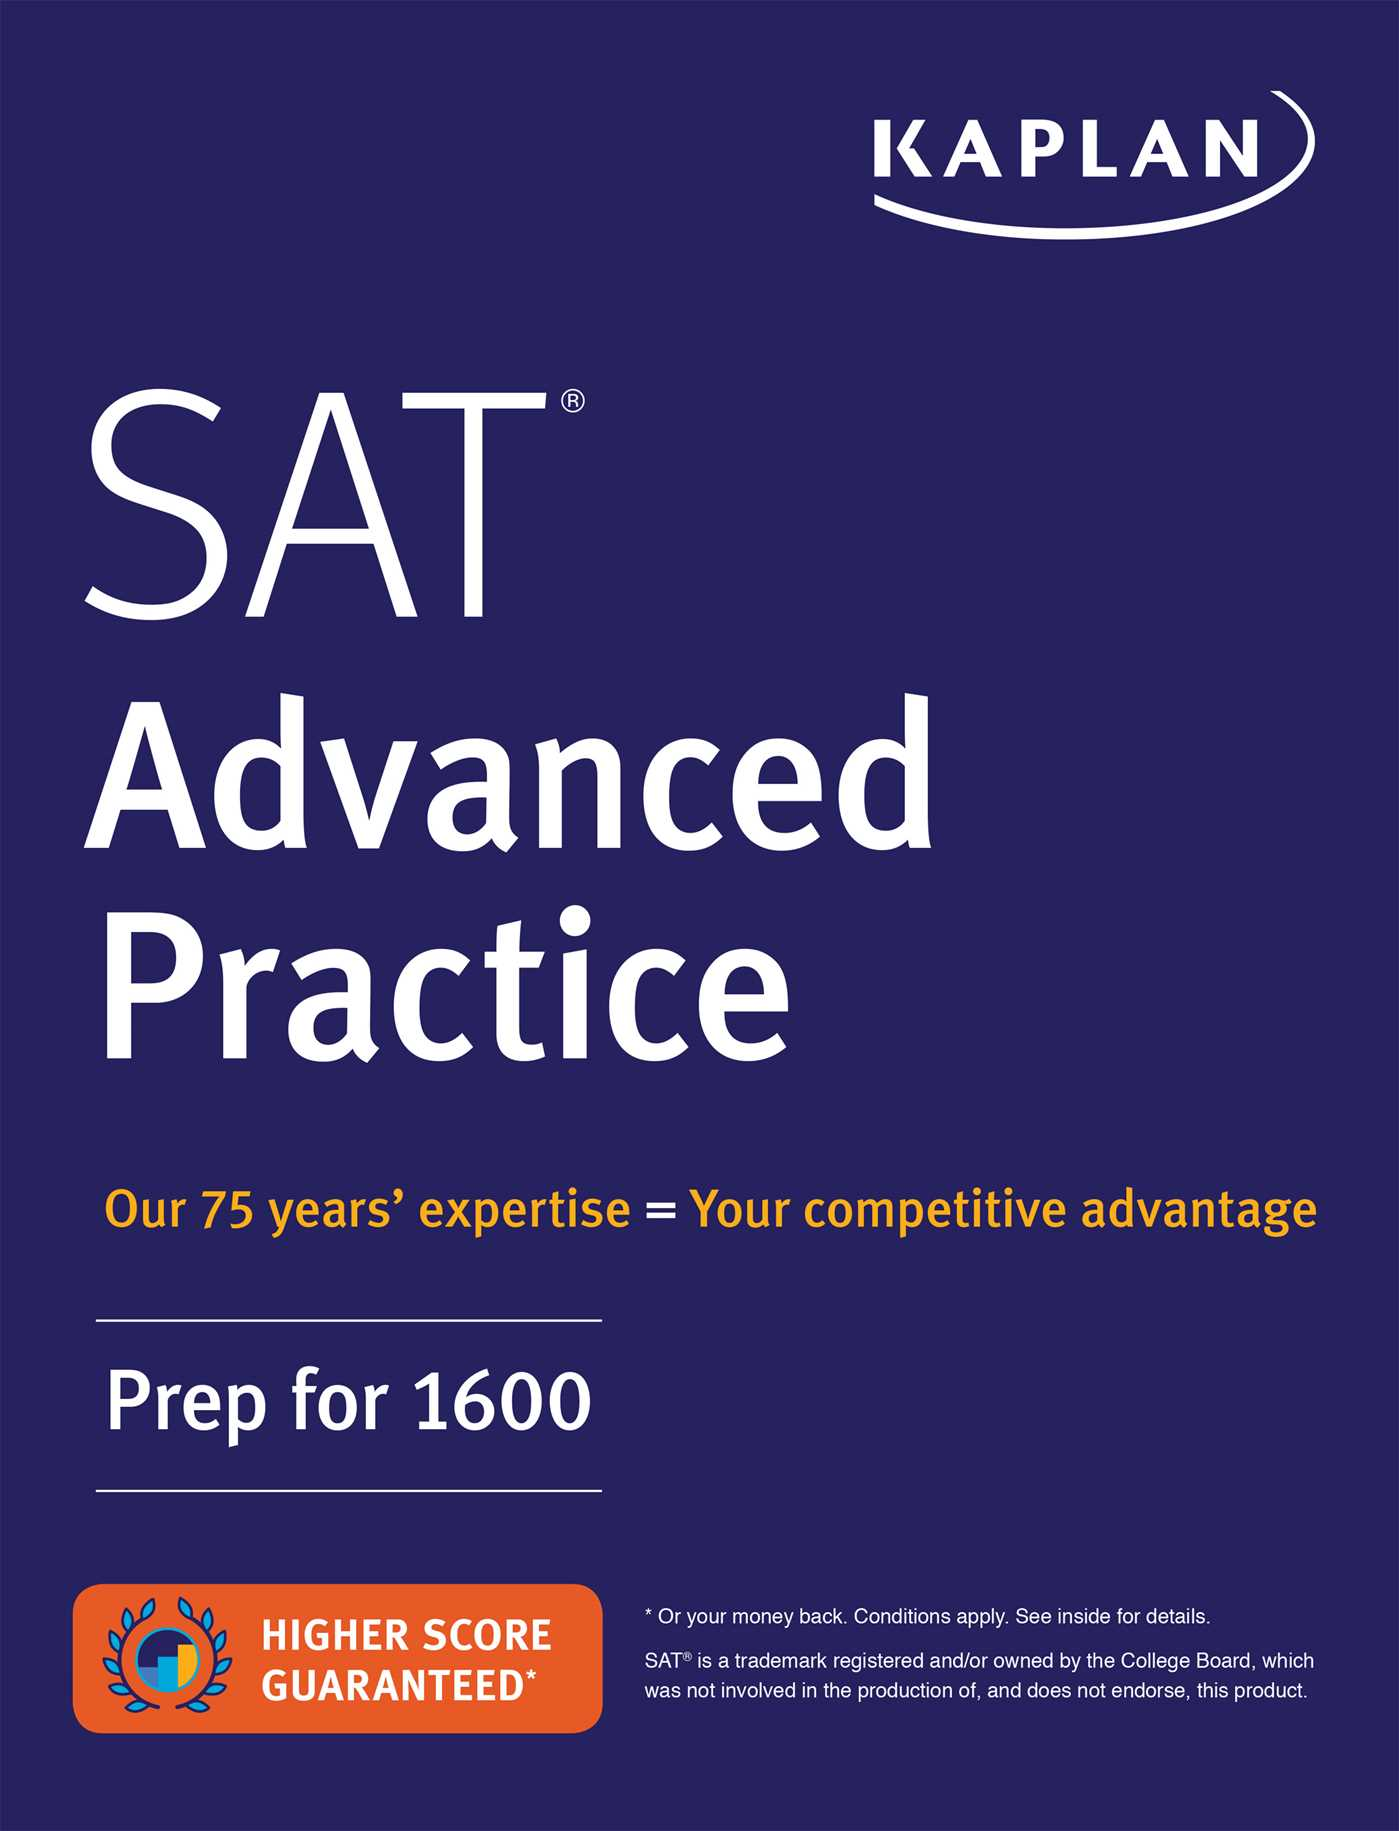 SAT Prep. CLASS or SAT Prep. BOOK?